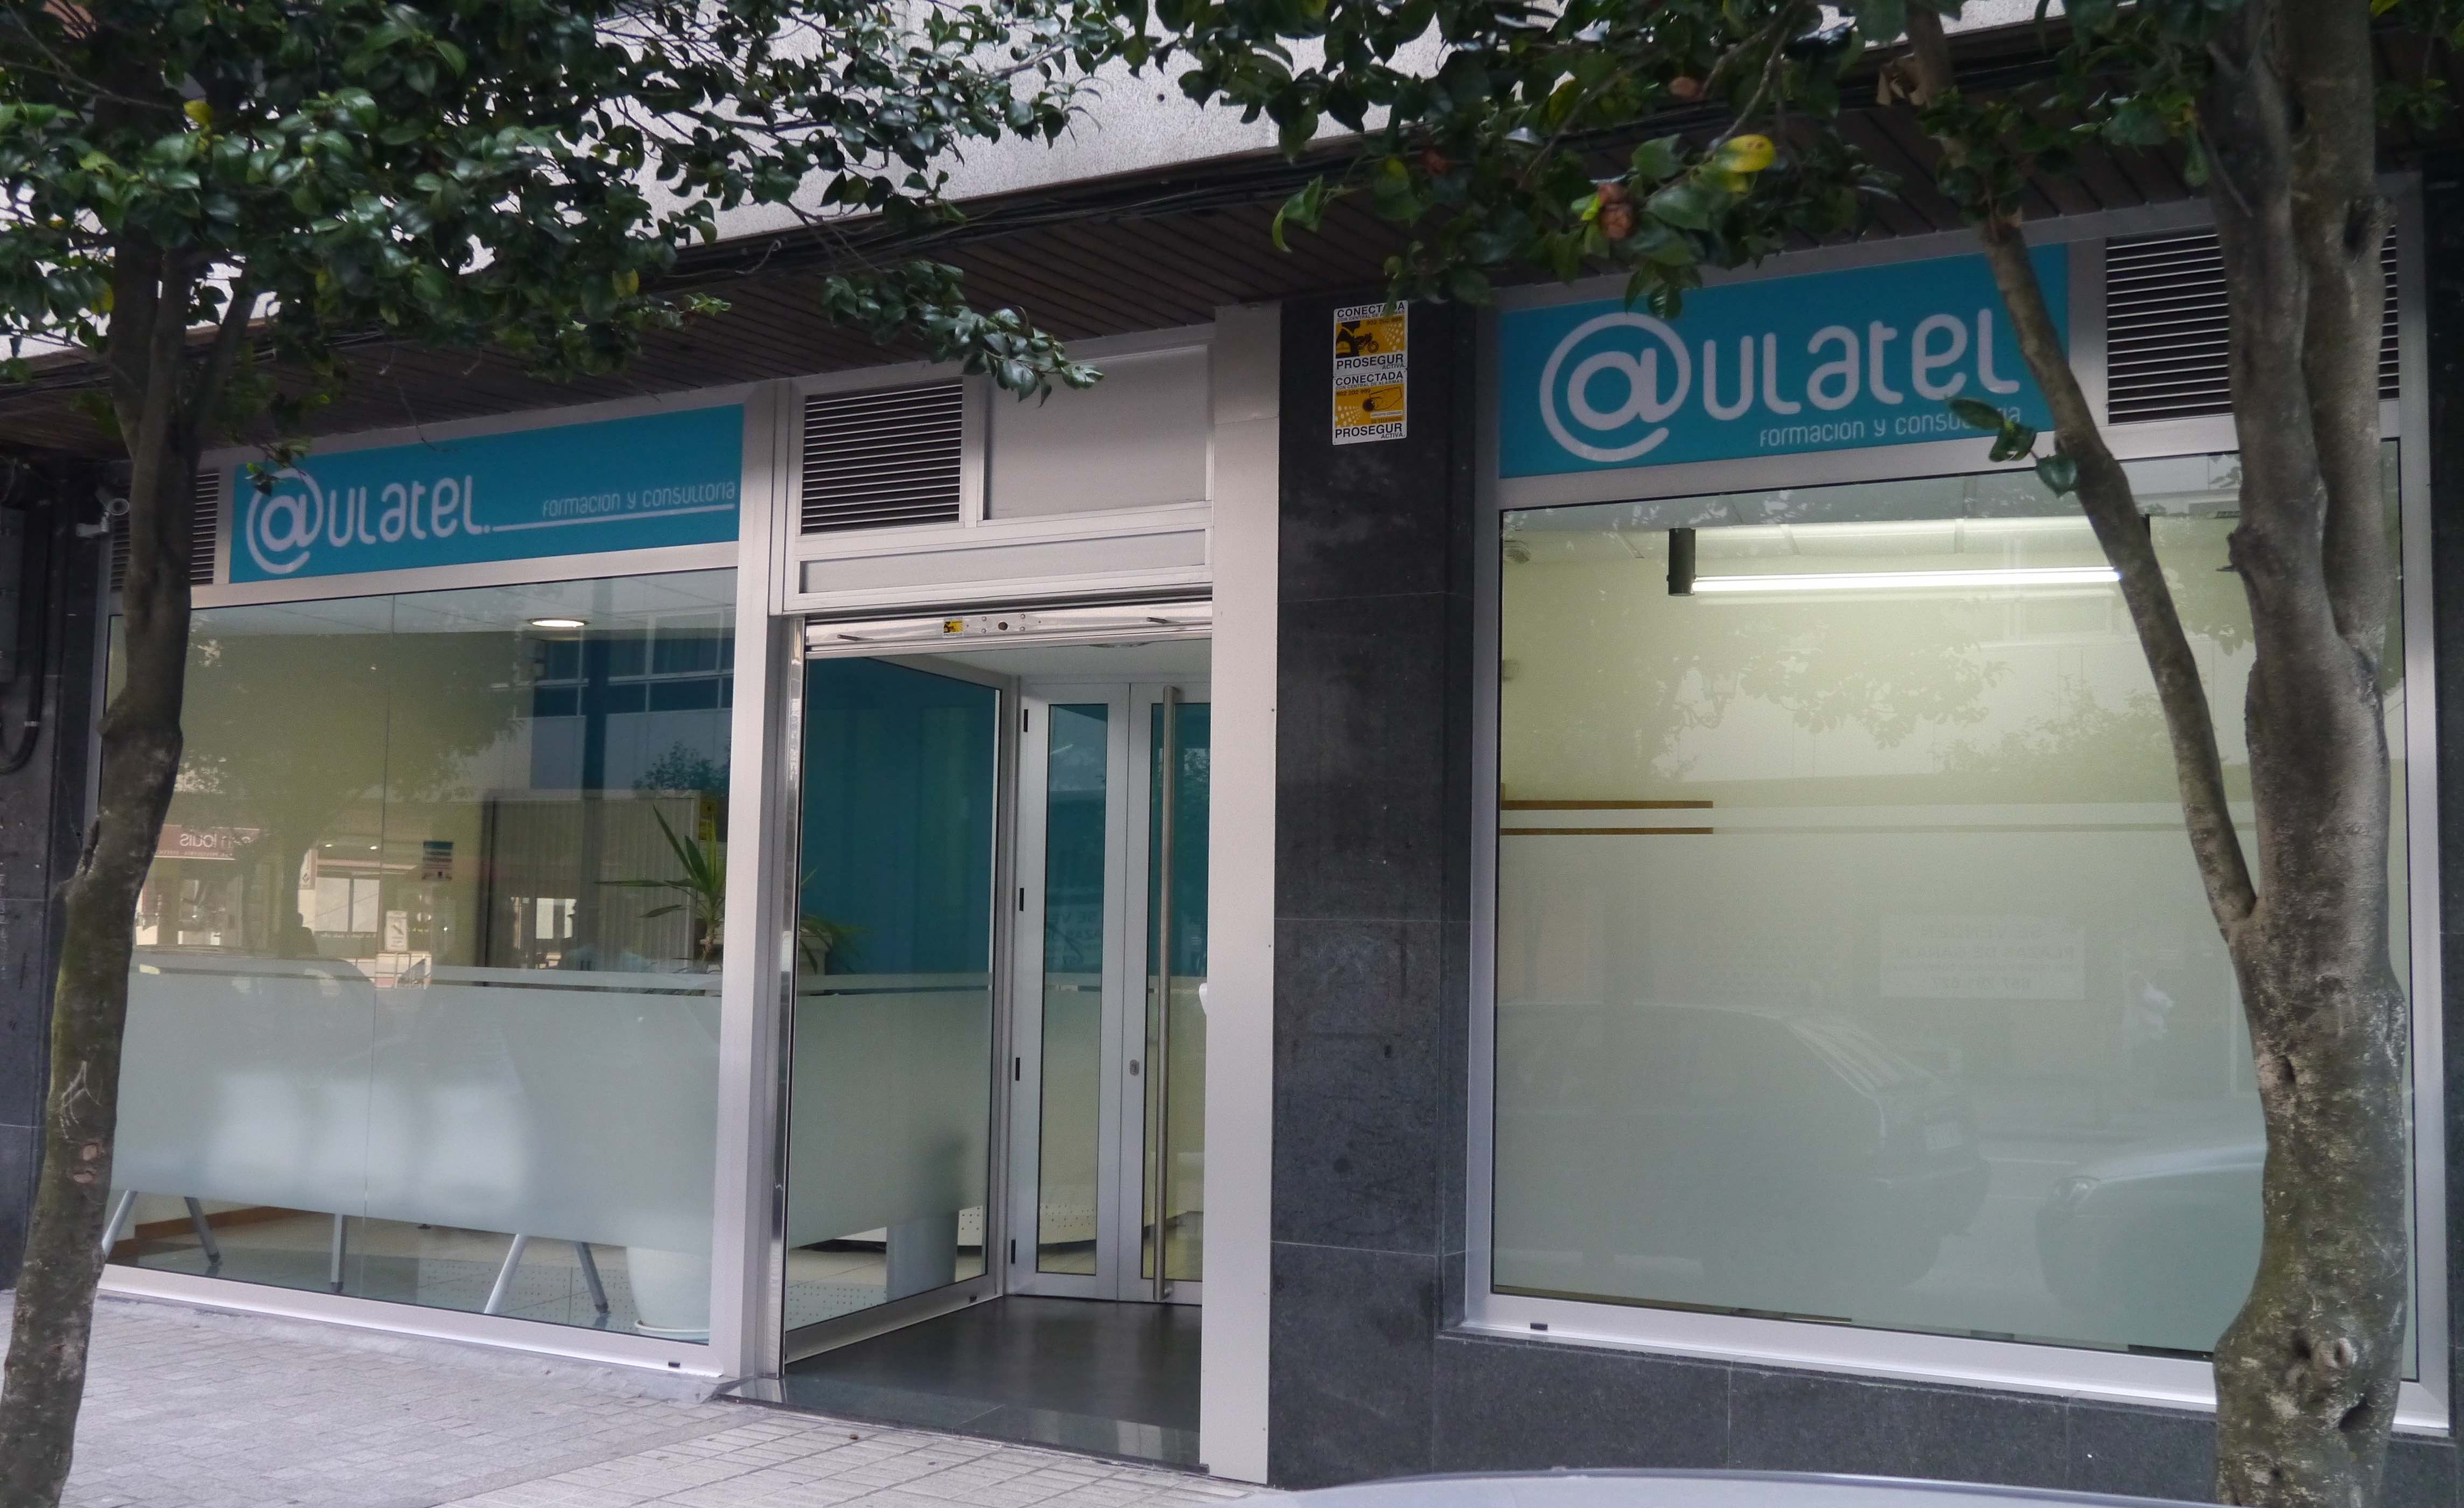 Aulatel